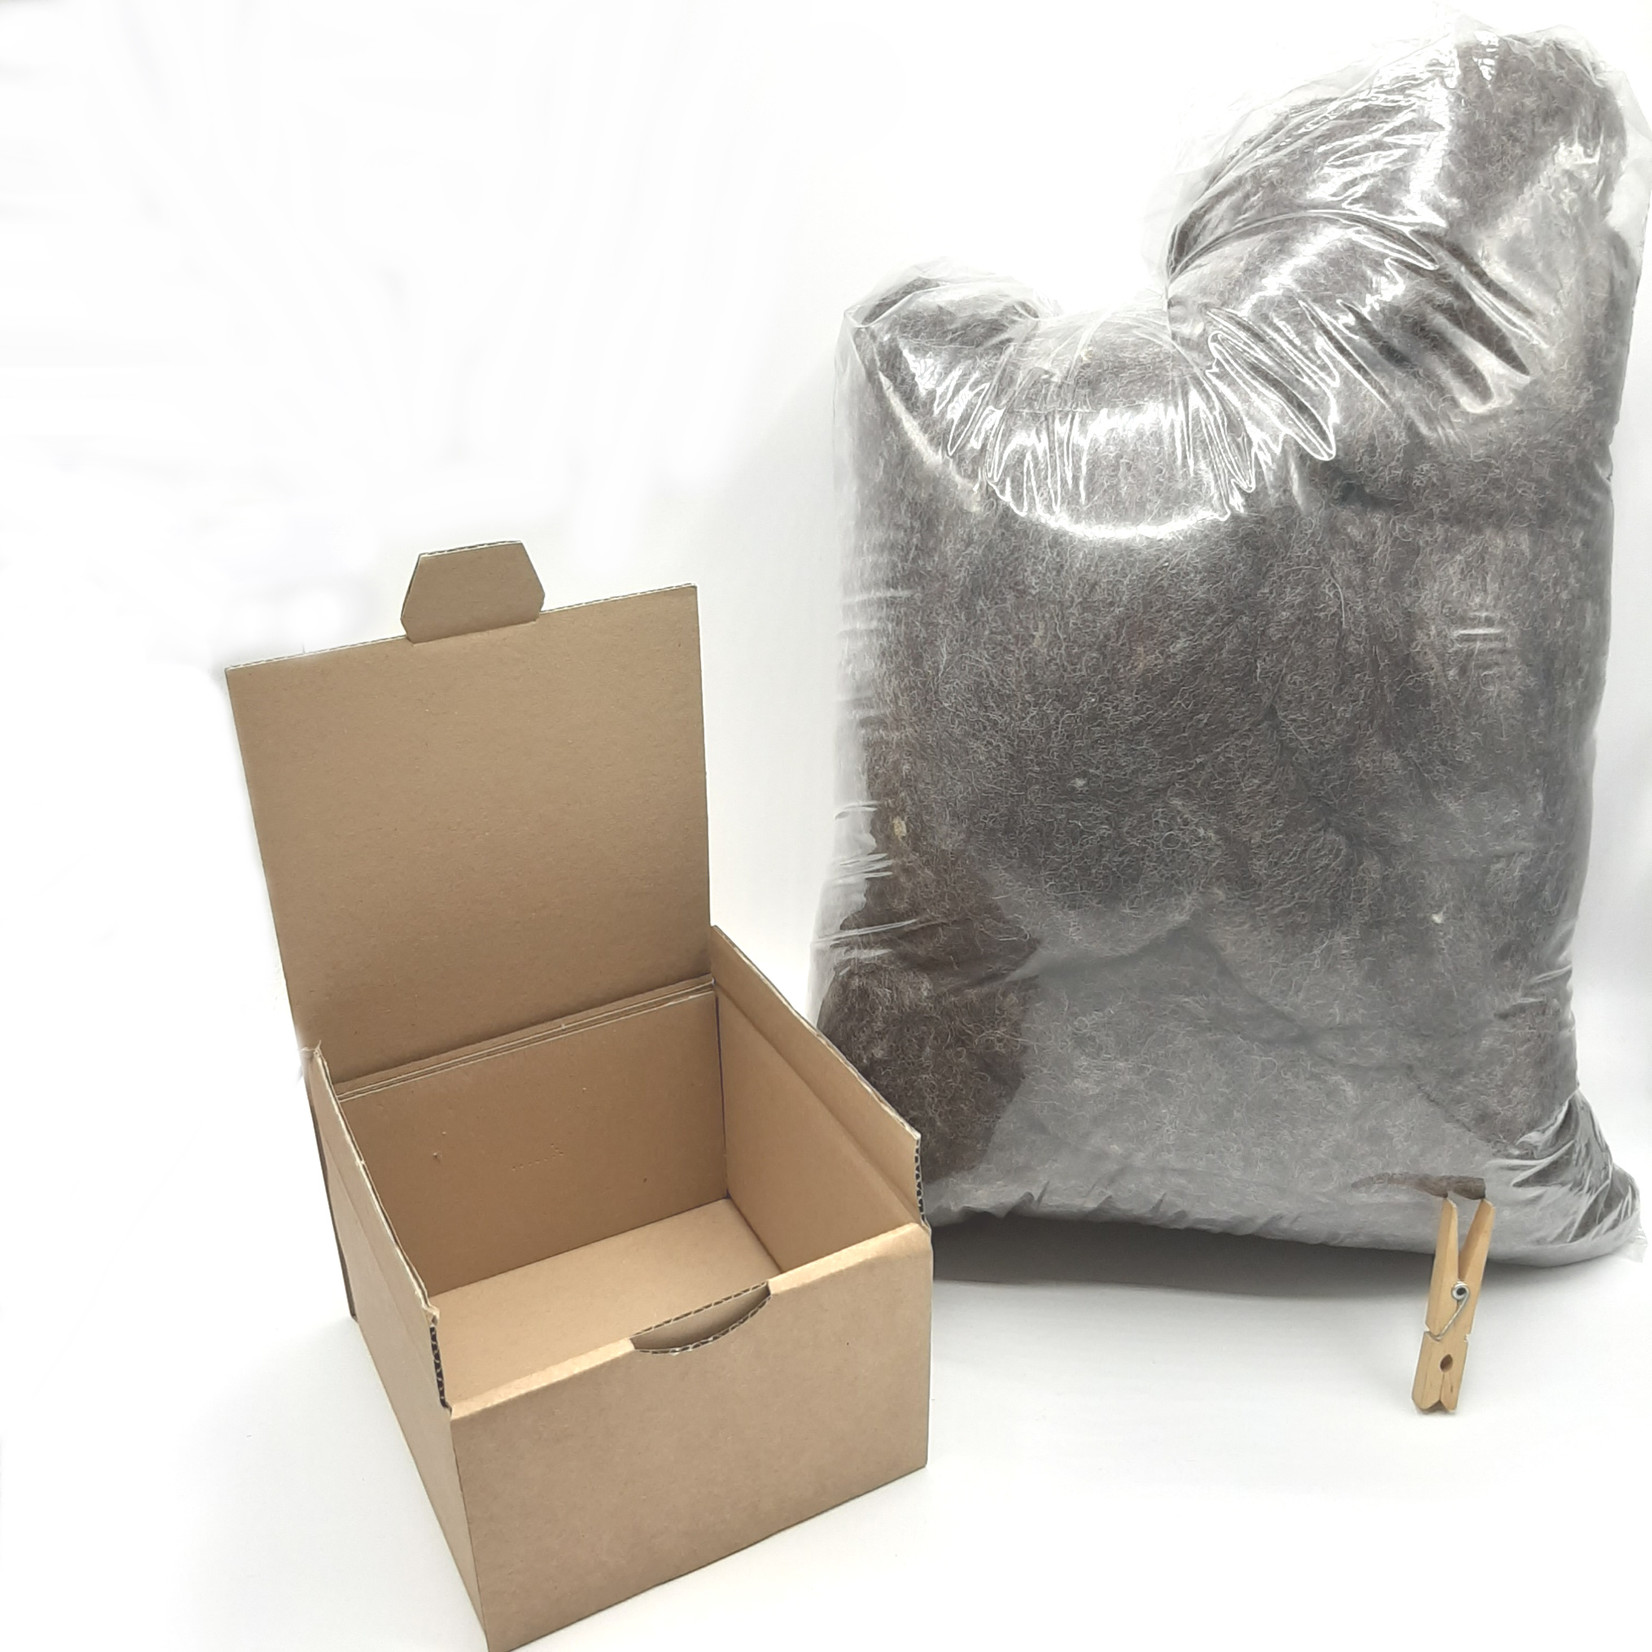 HollandWool vulwol 1000 gram - 100% wol - Nederlandse gewassen, gekaarde Schapenwol MELEE, licht ingevet, grijs